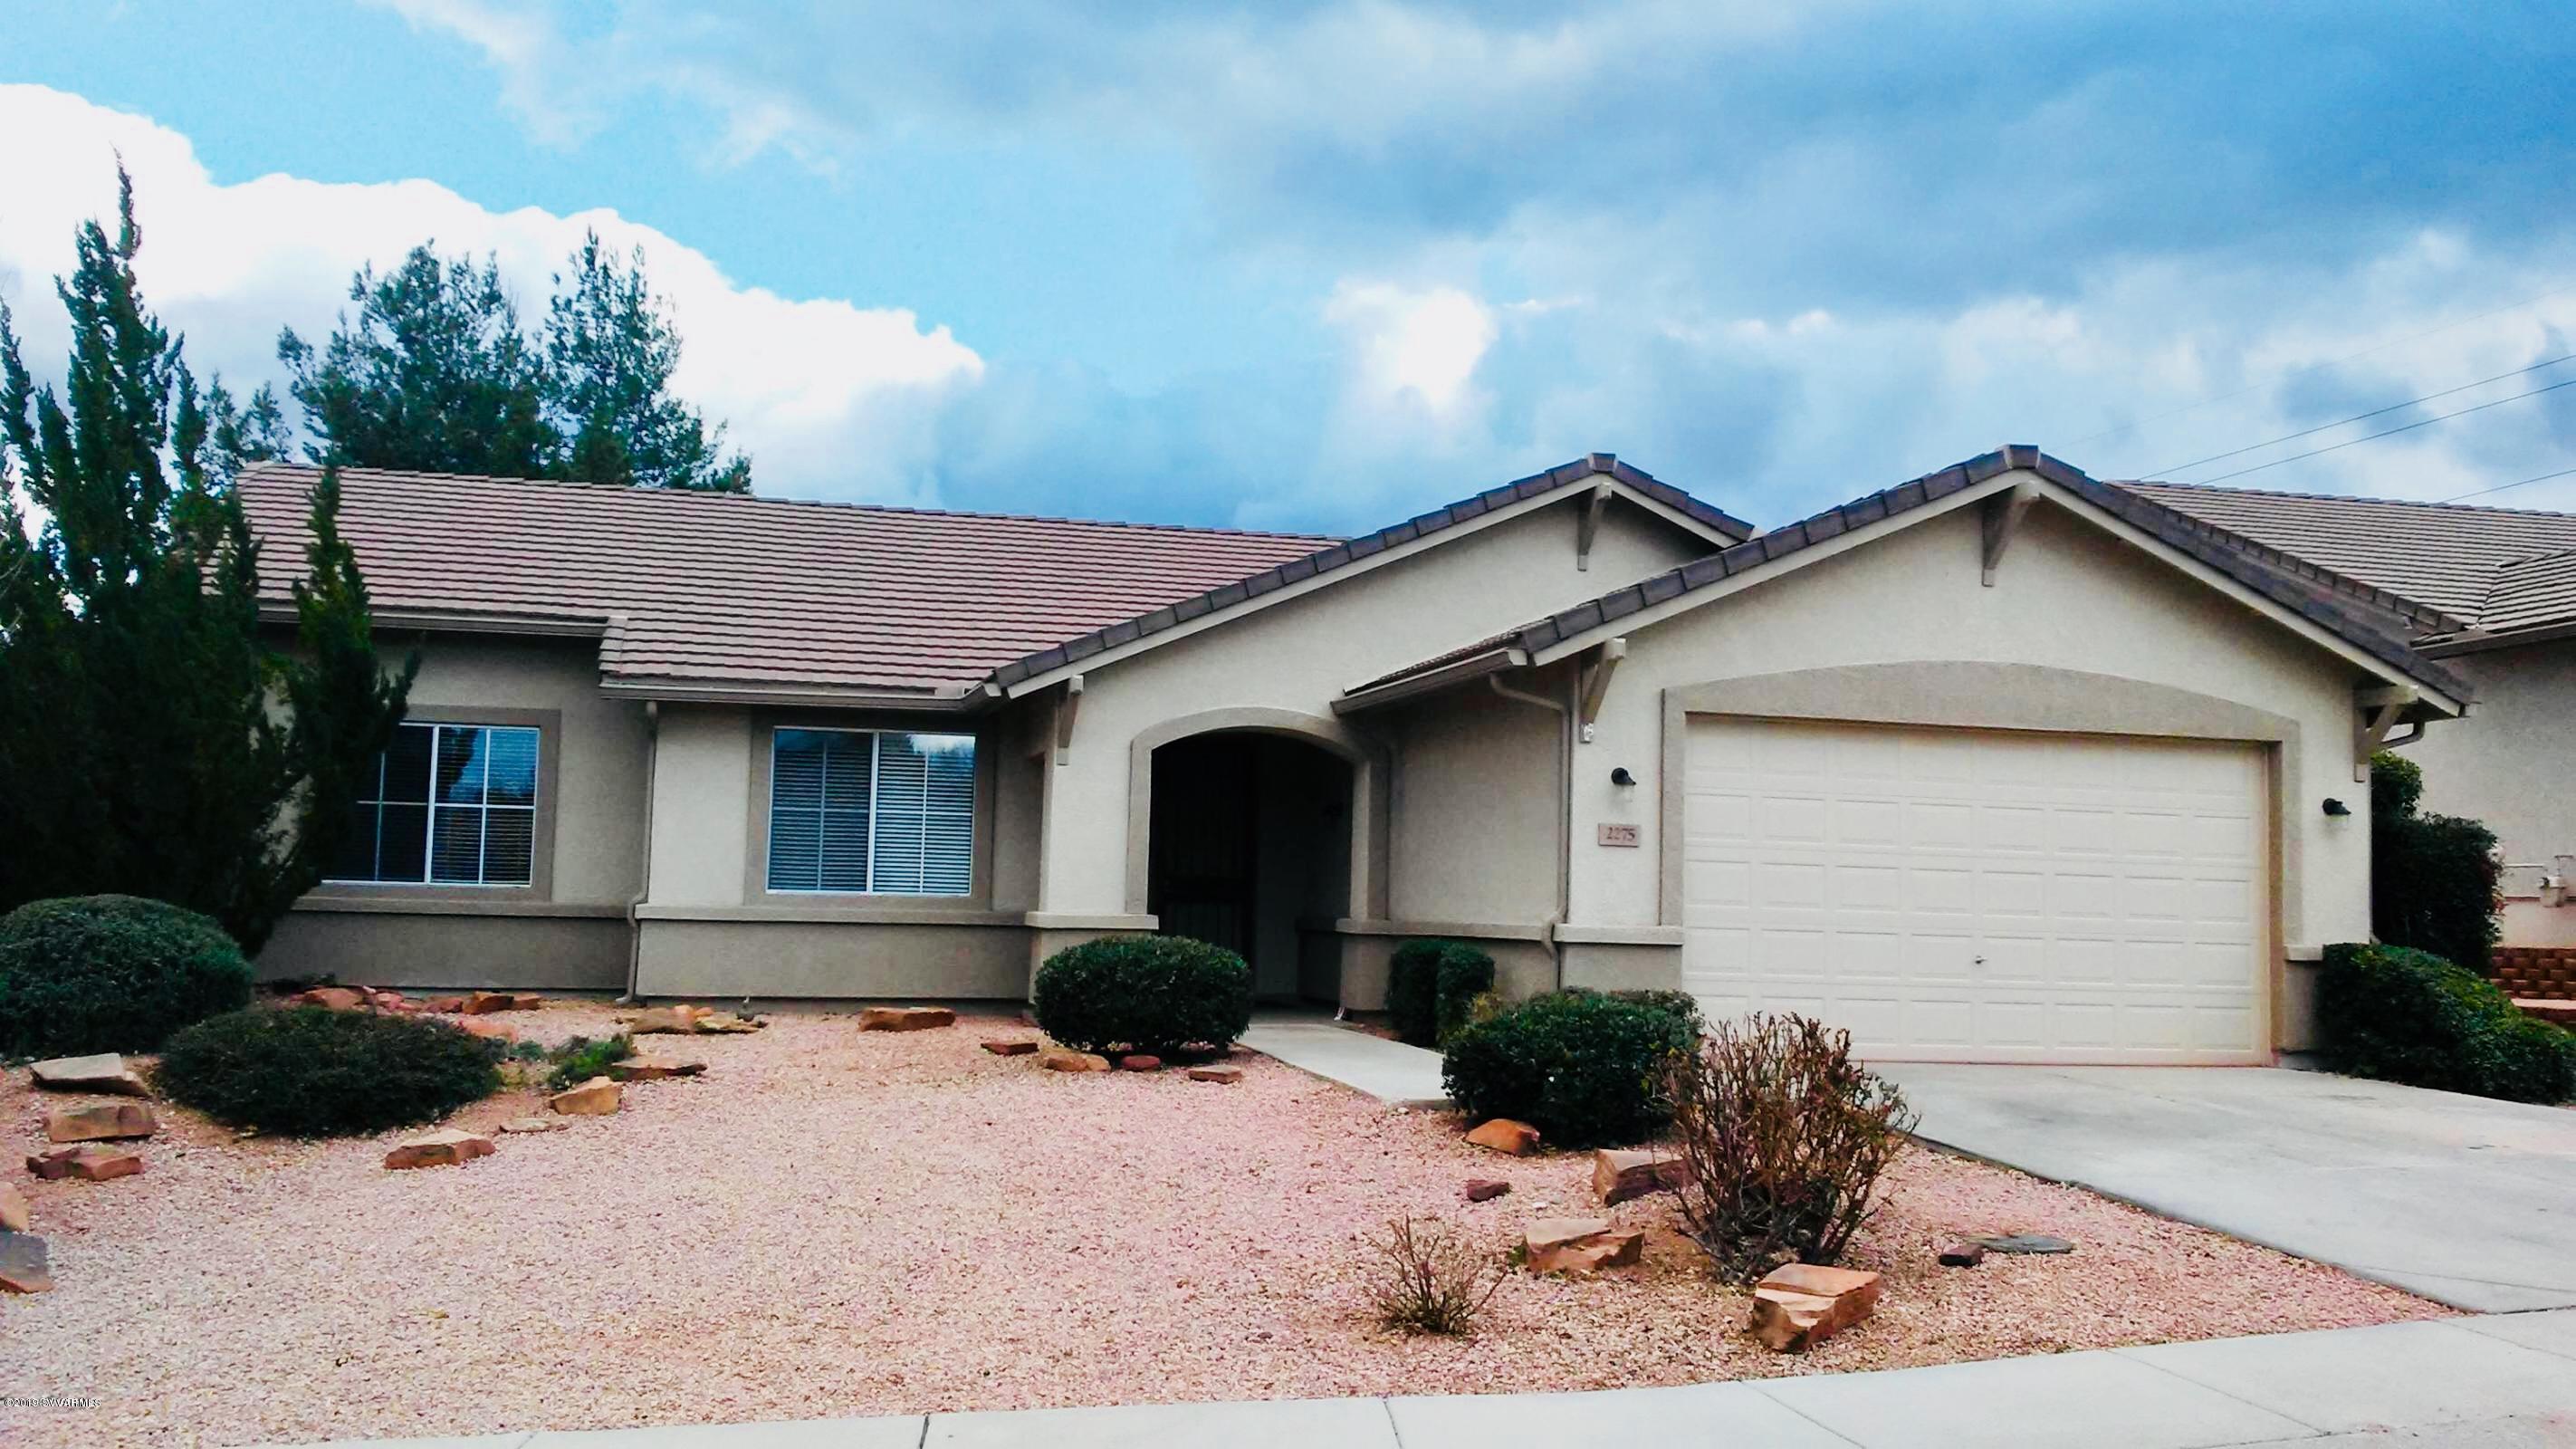 2275 W Running Iron Lane Cottonwood, AZ 86326